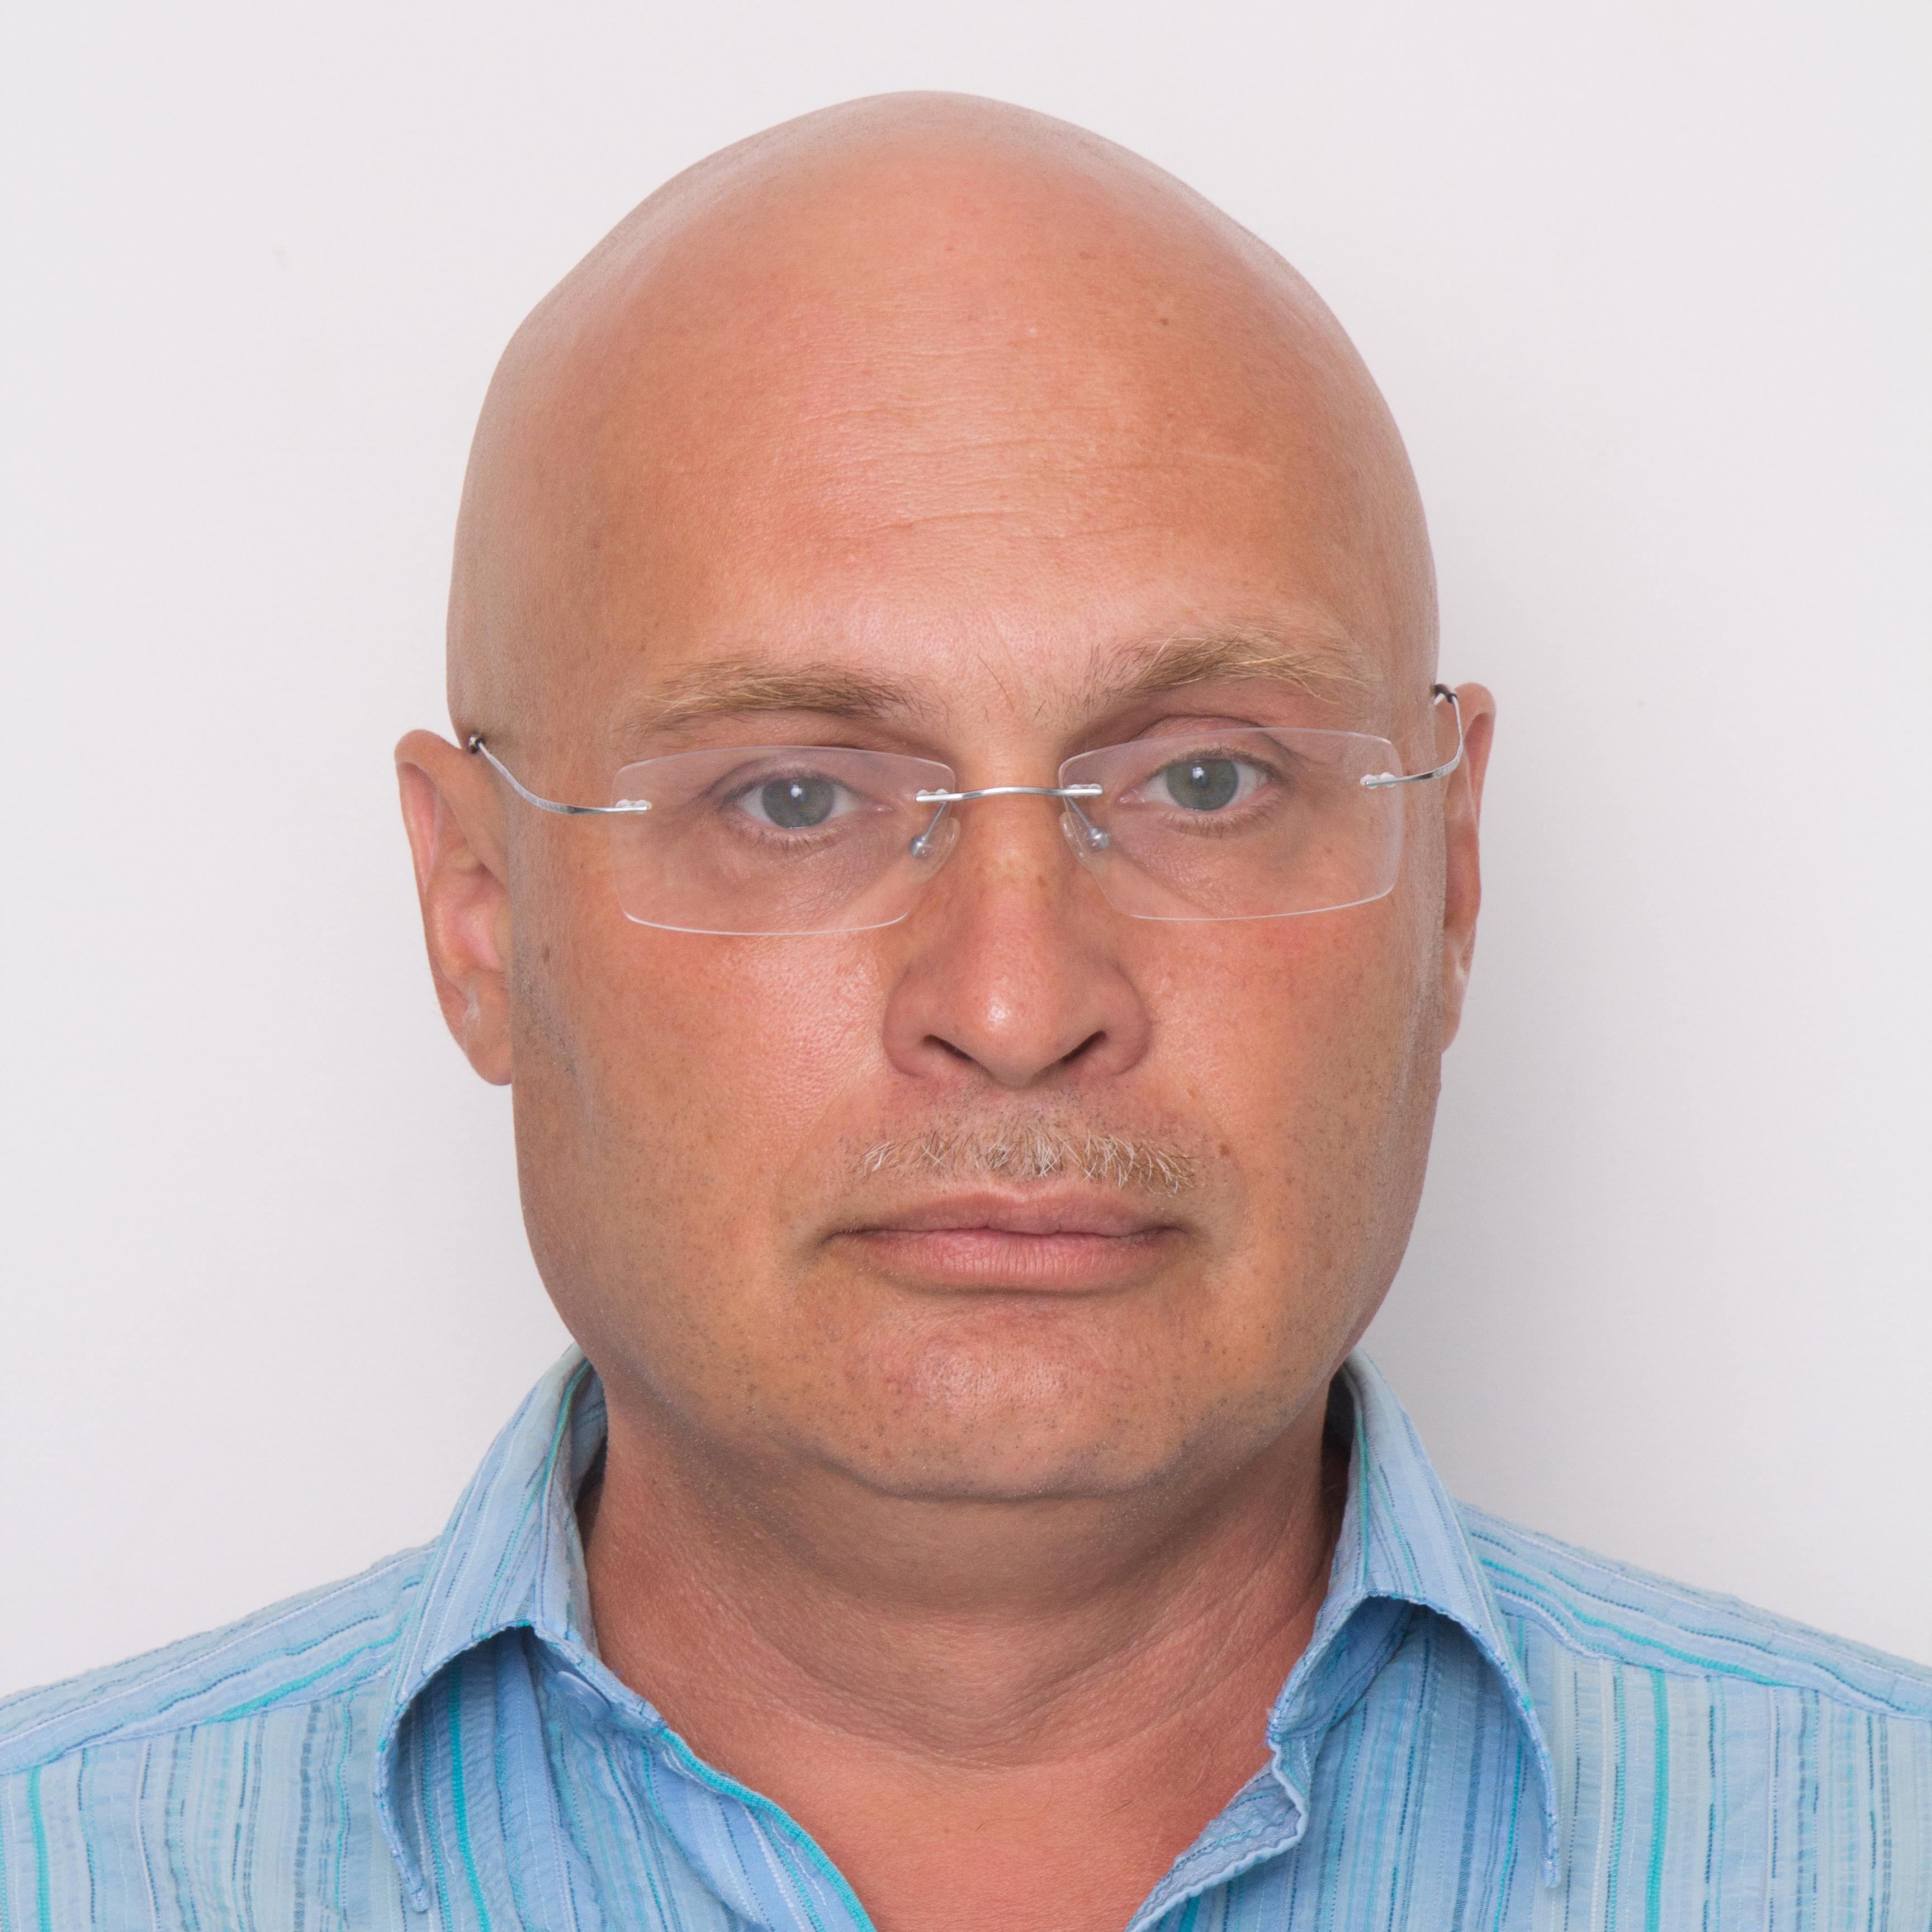 Черников Виктор Васильевич